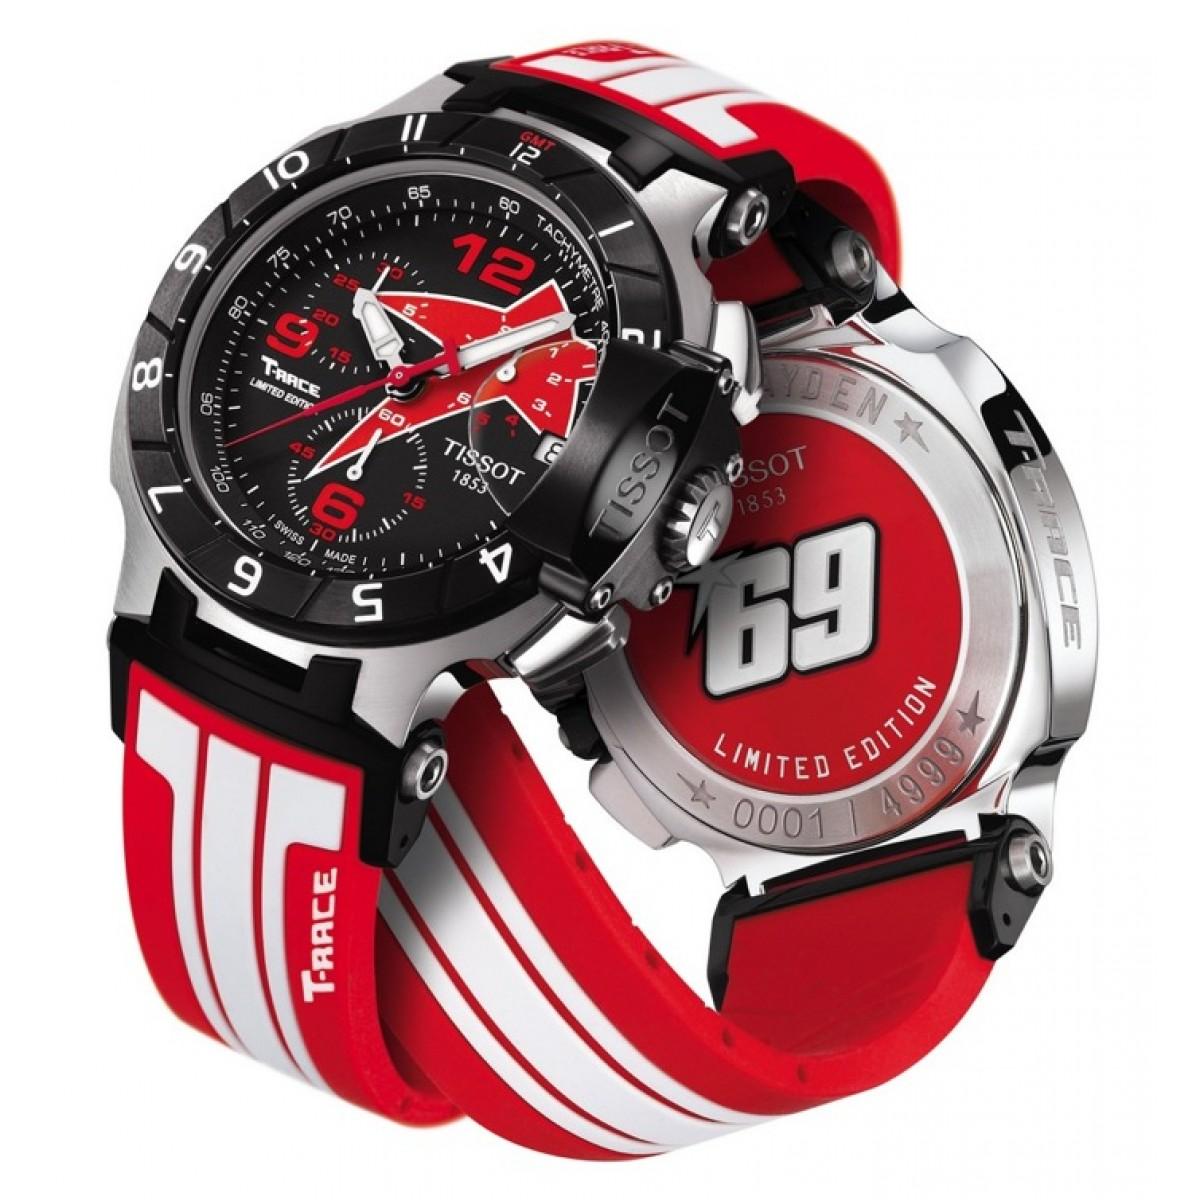 688fe31e0a4 Relógio Réplica Tissot T-Race Nicky Hayden Edition Especial